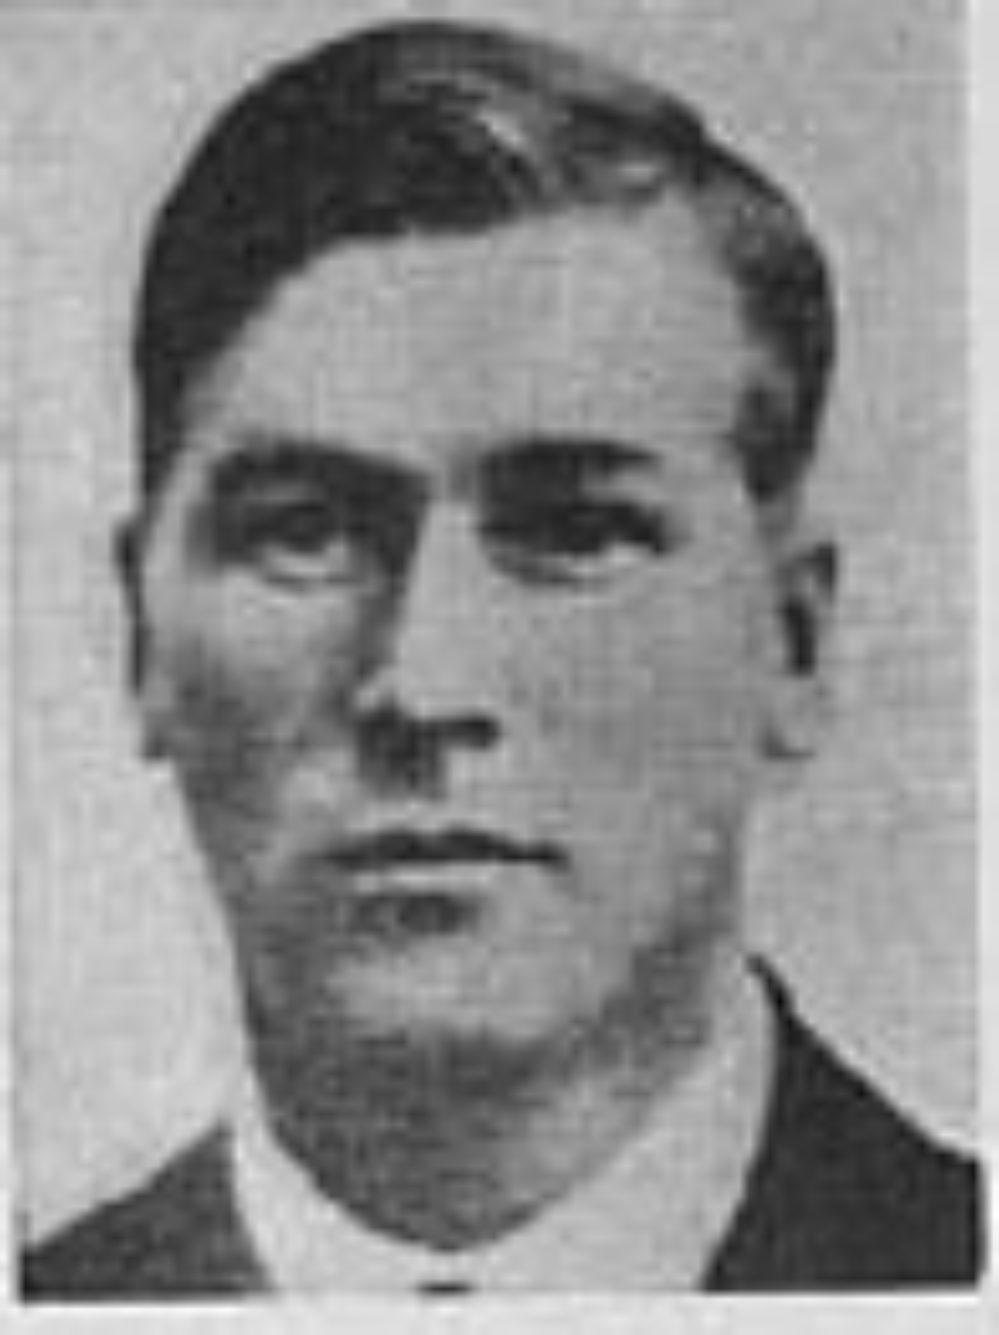 Einar Wegger